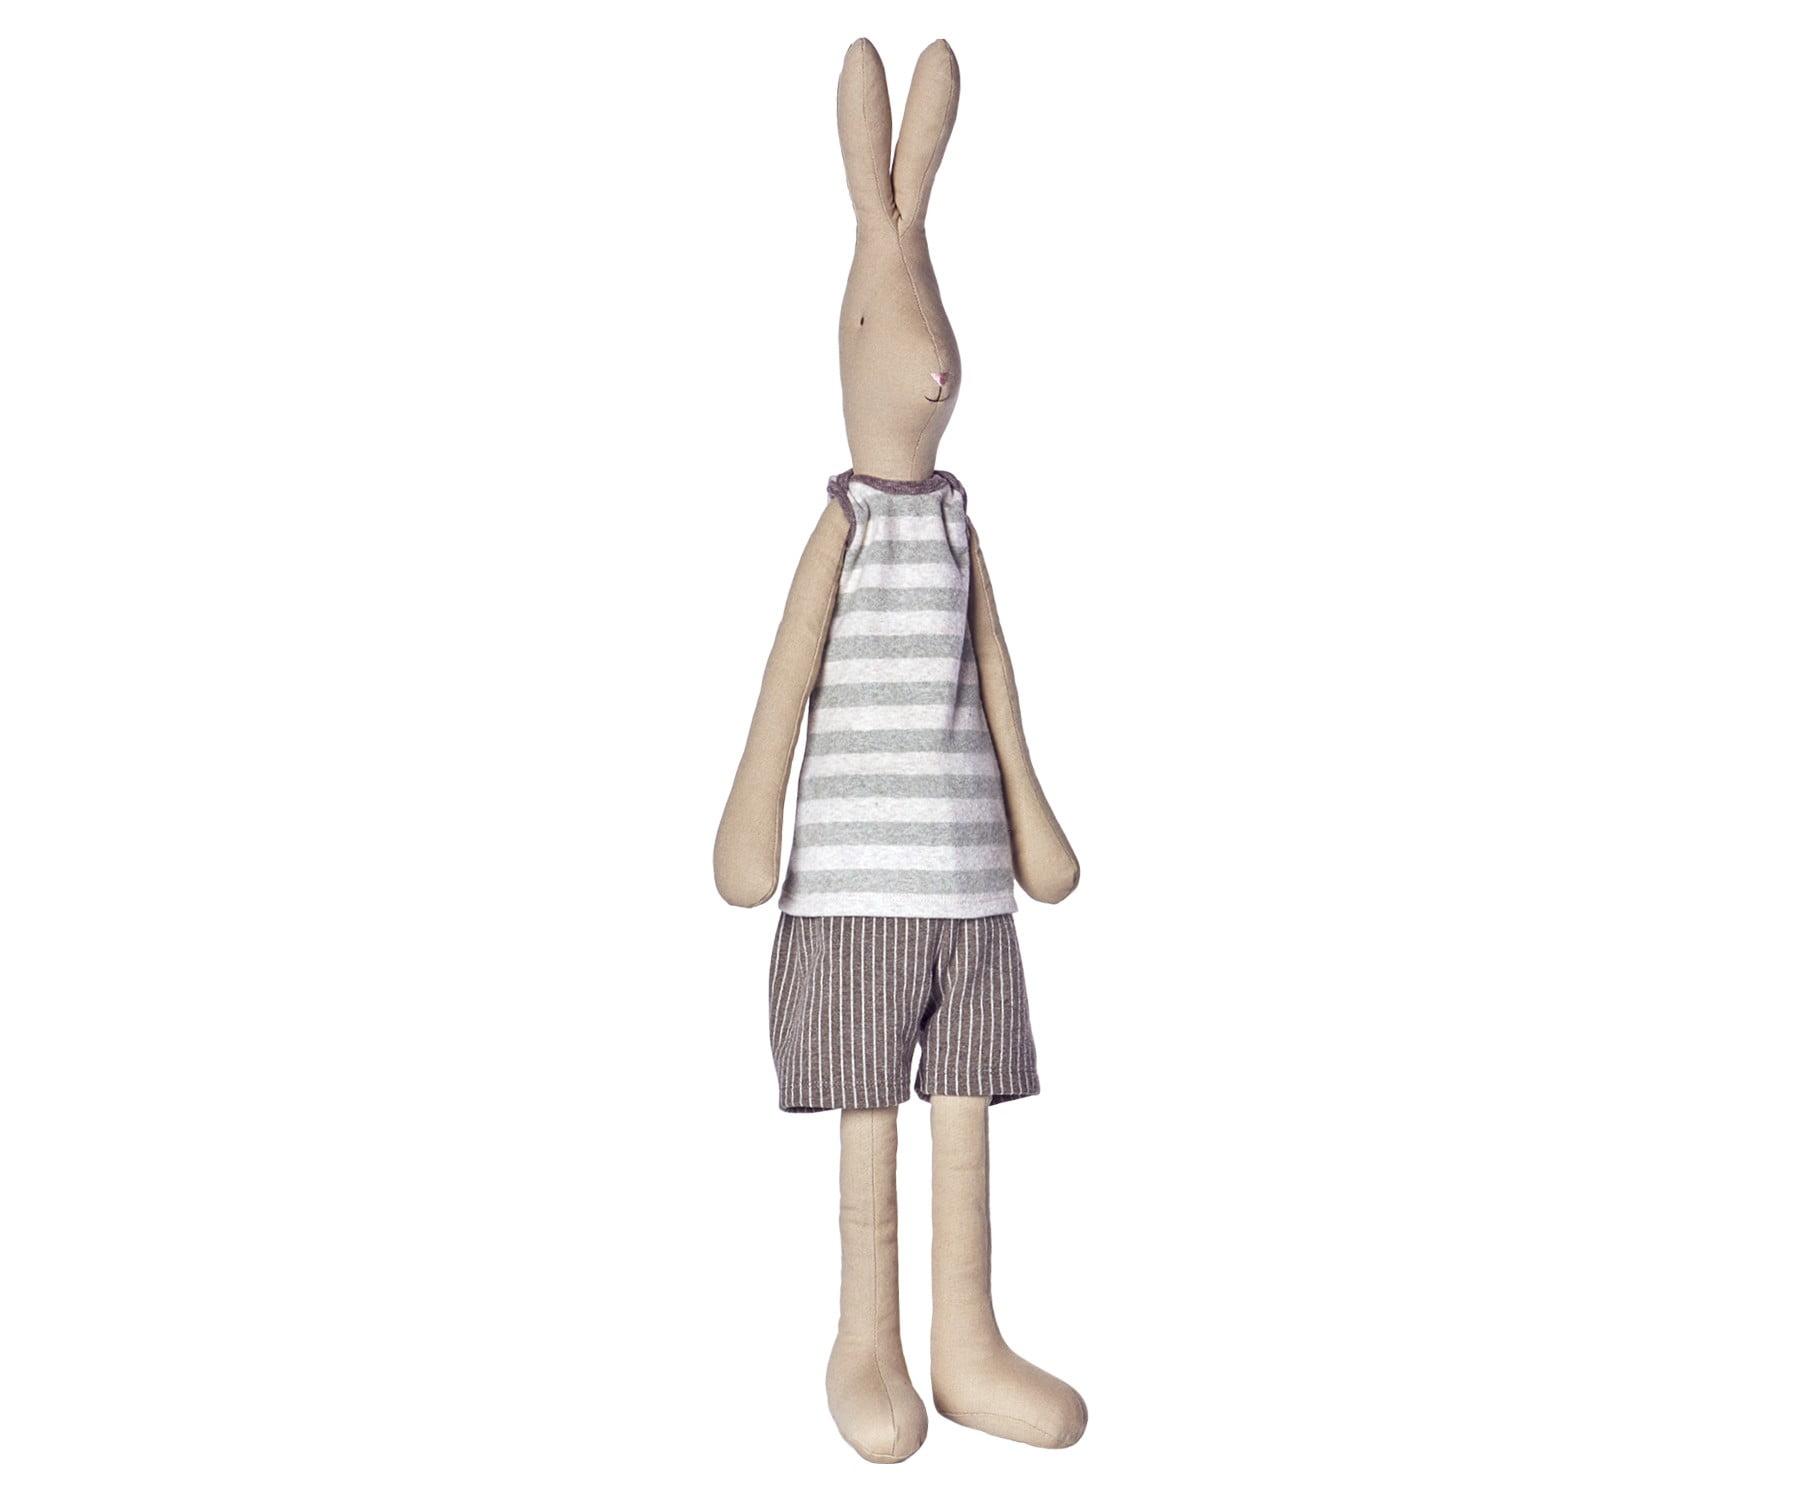 zajacik-chlapec-mega-1-dadaboom-sk